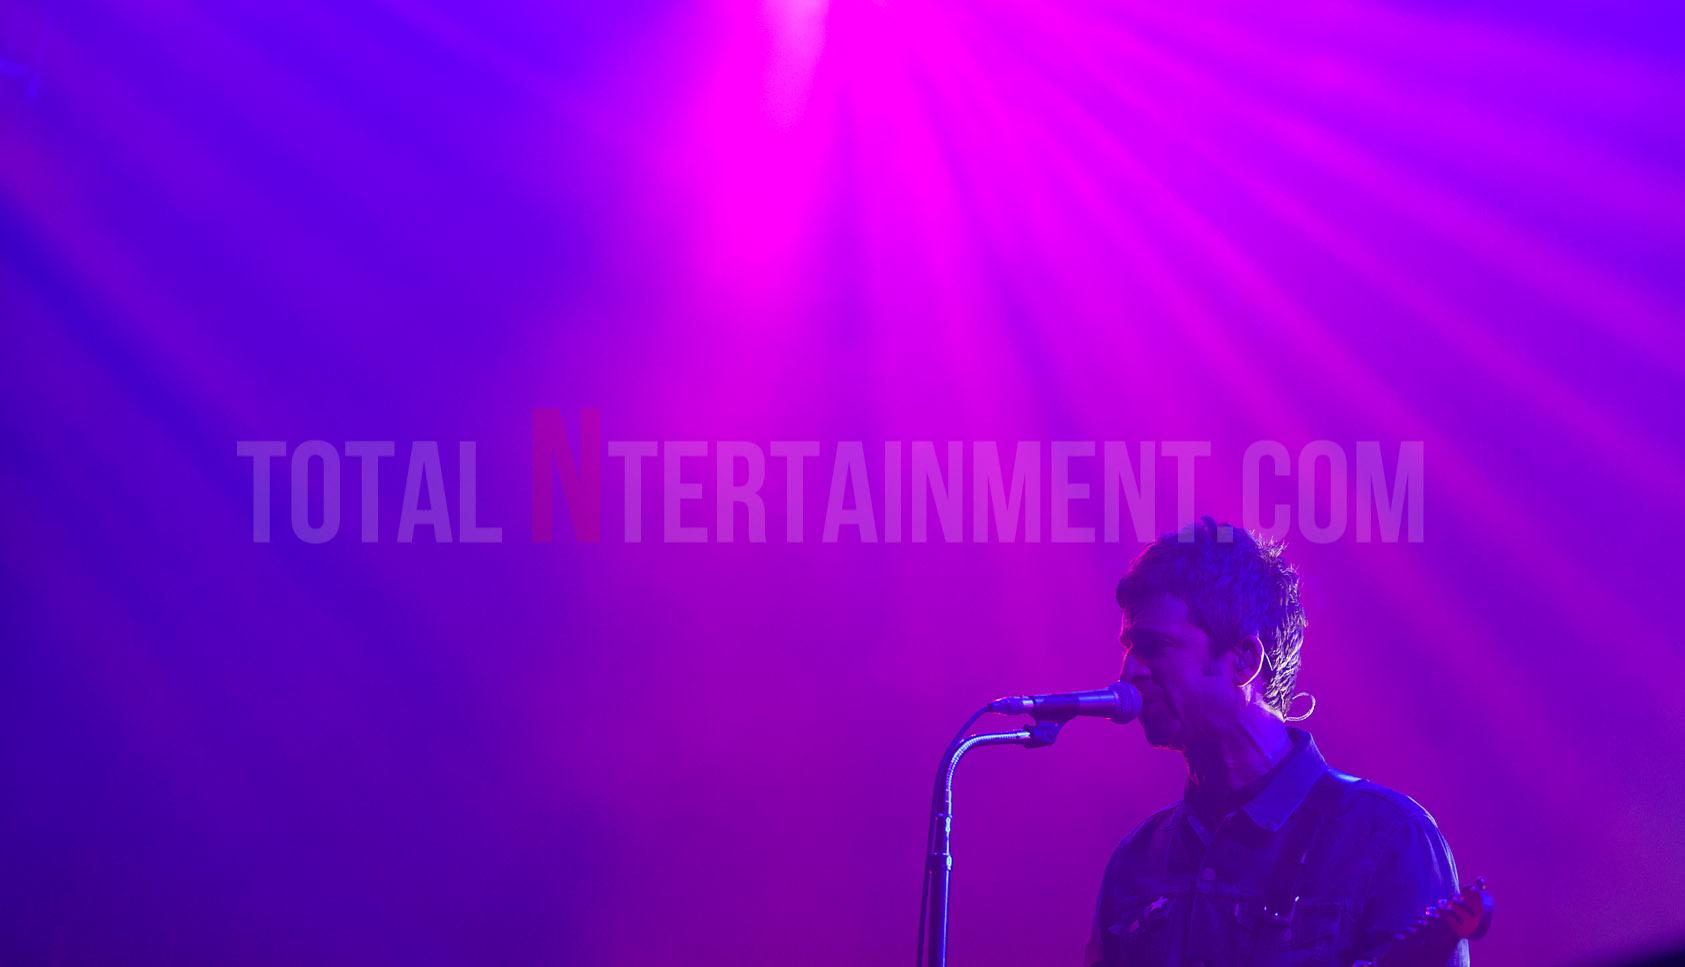 Noel Gallagher, NGHFB, High Flying Birds, tour, Leeds, Jo Forrest, TotalNtertainment